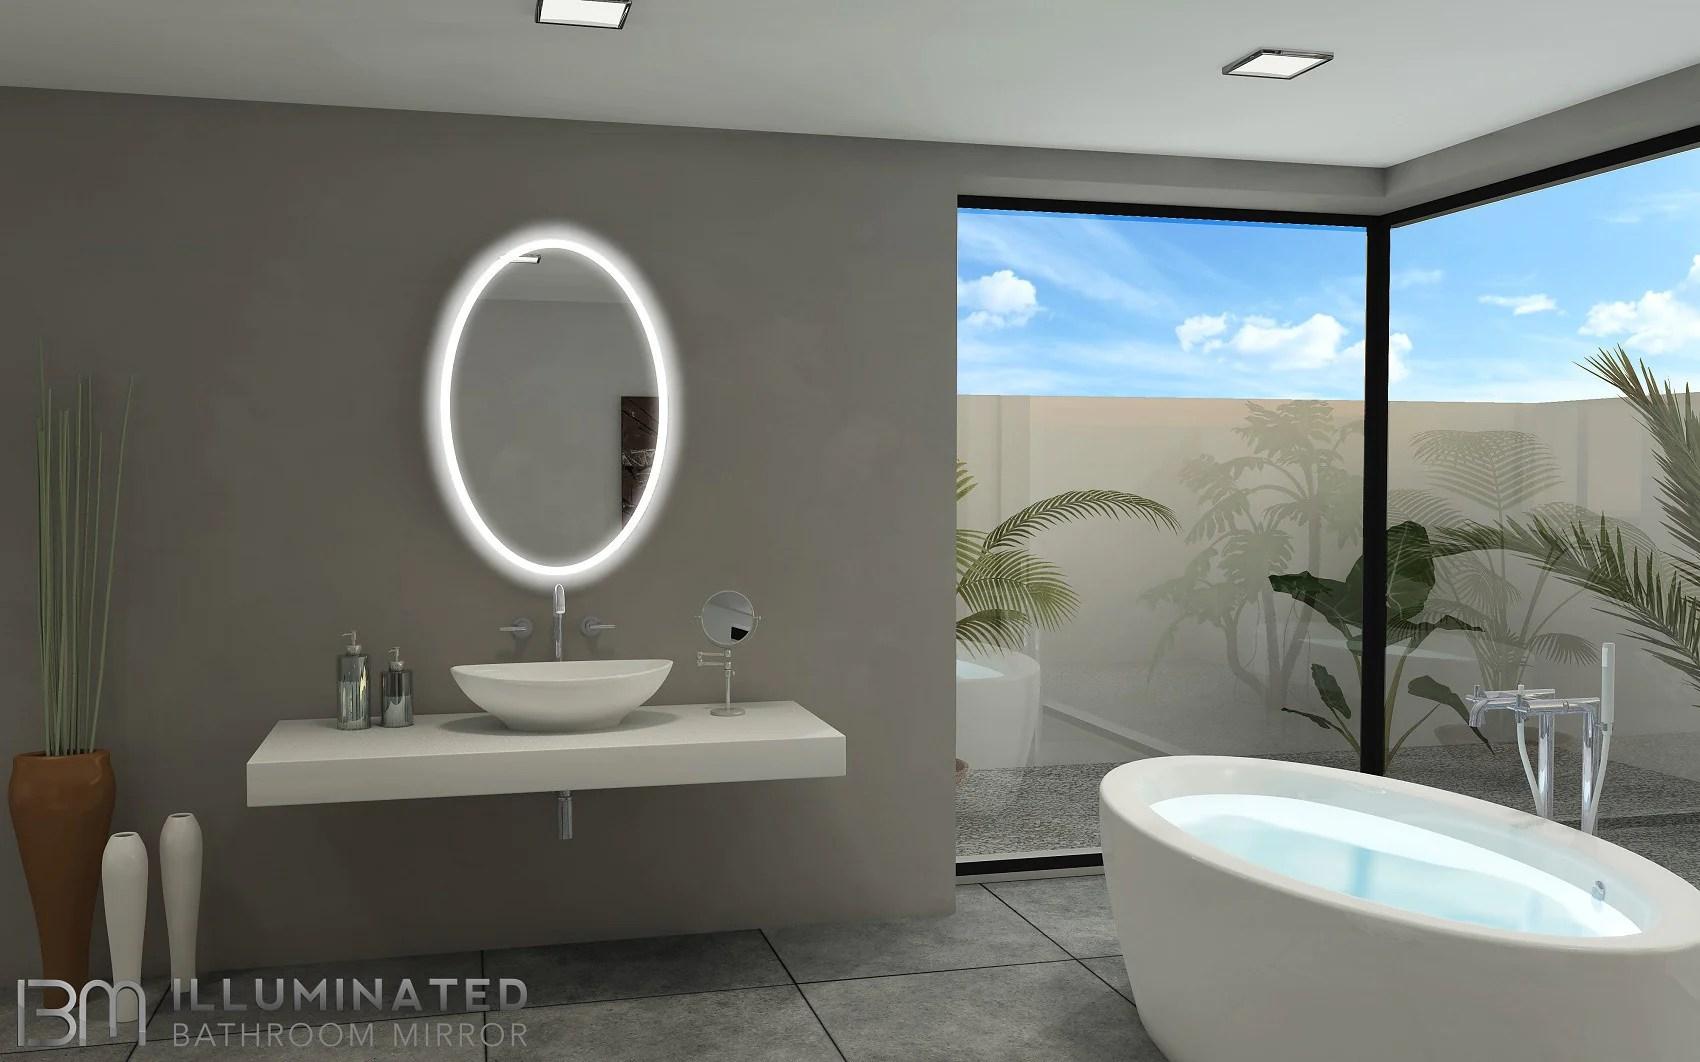 BACKLIT Bathroom MIRROR OVAL 24 X 36 In